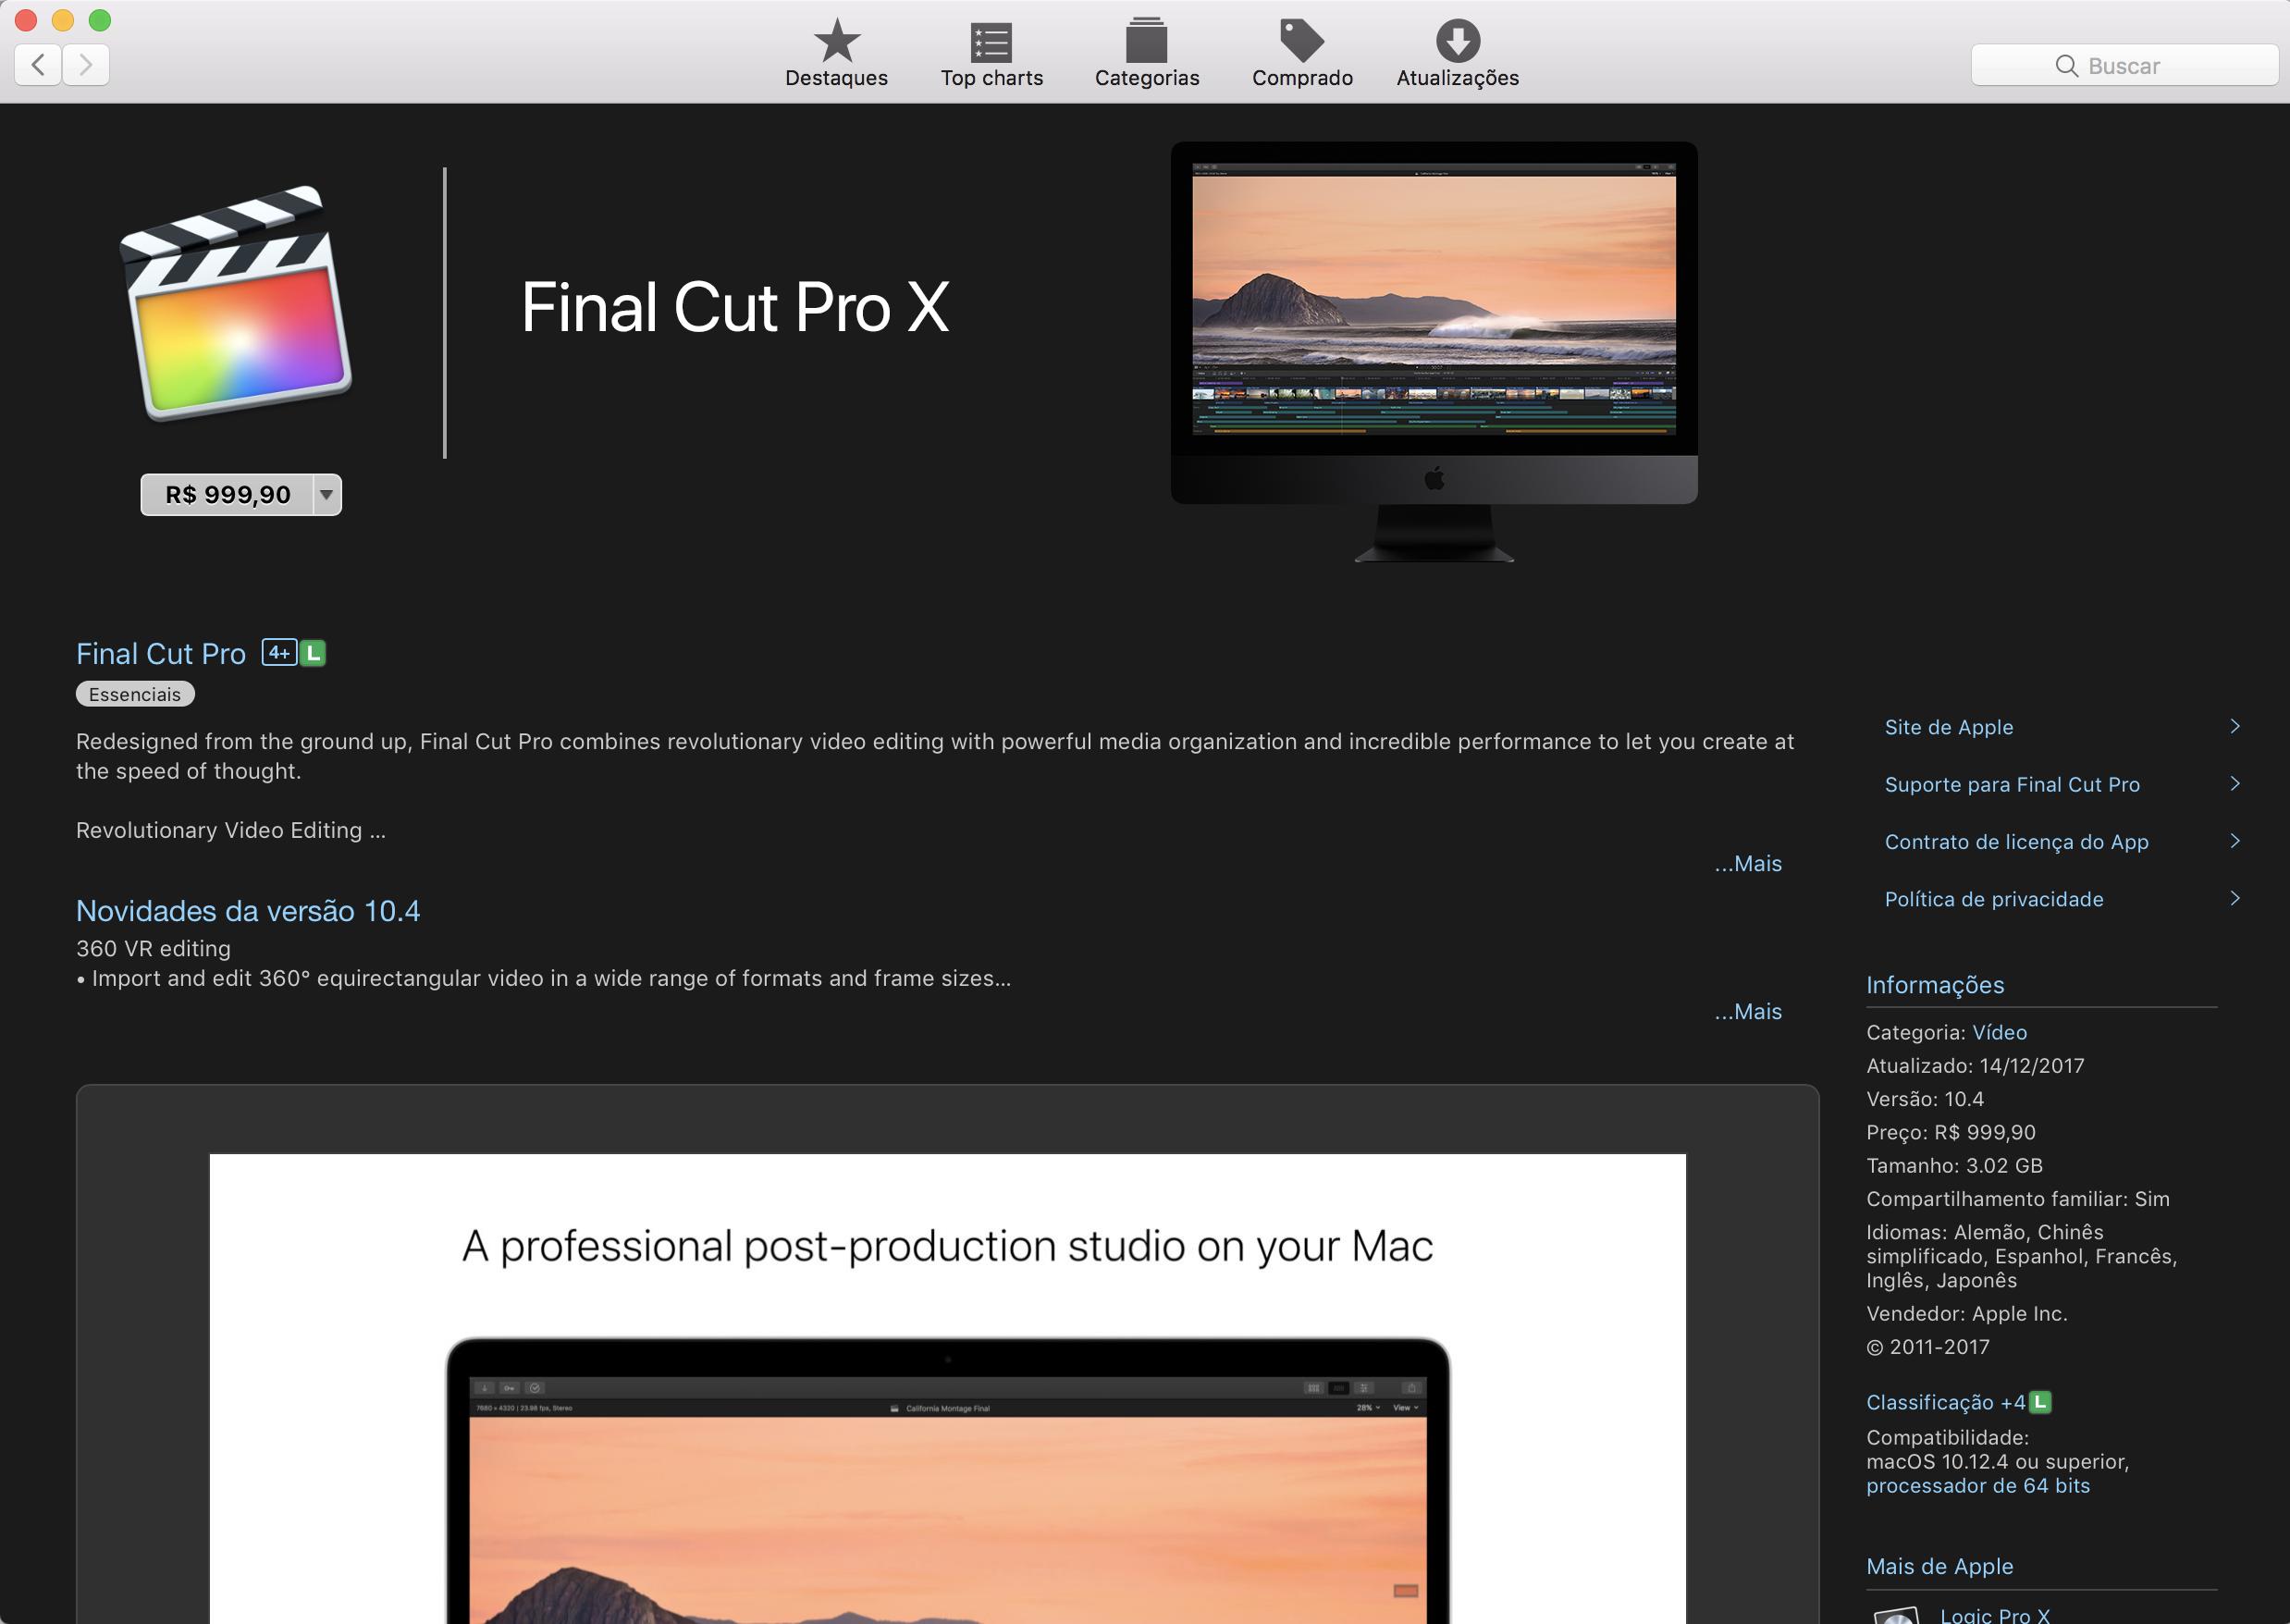 Final Cut Pro X Free Download For Mac